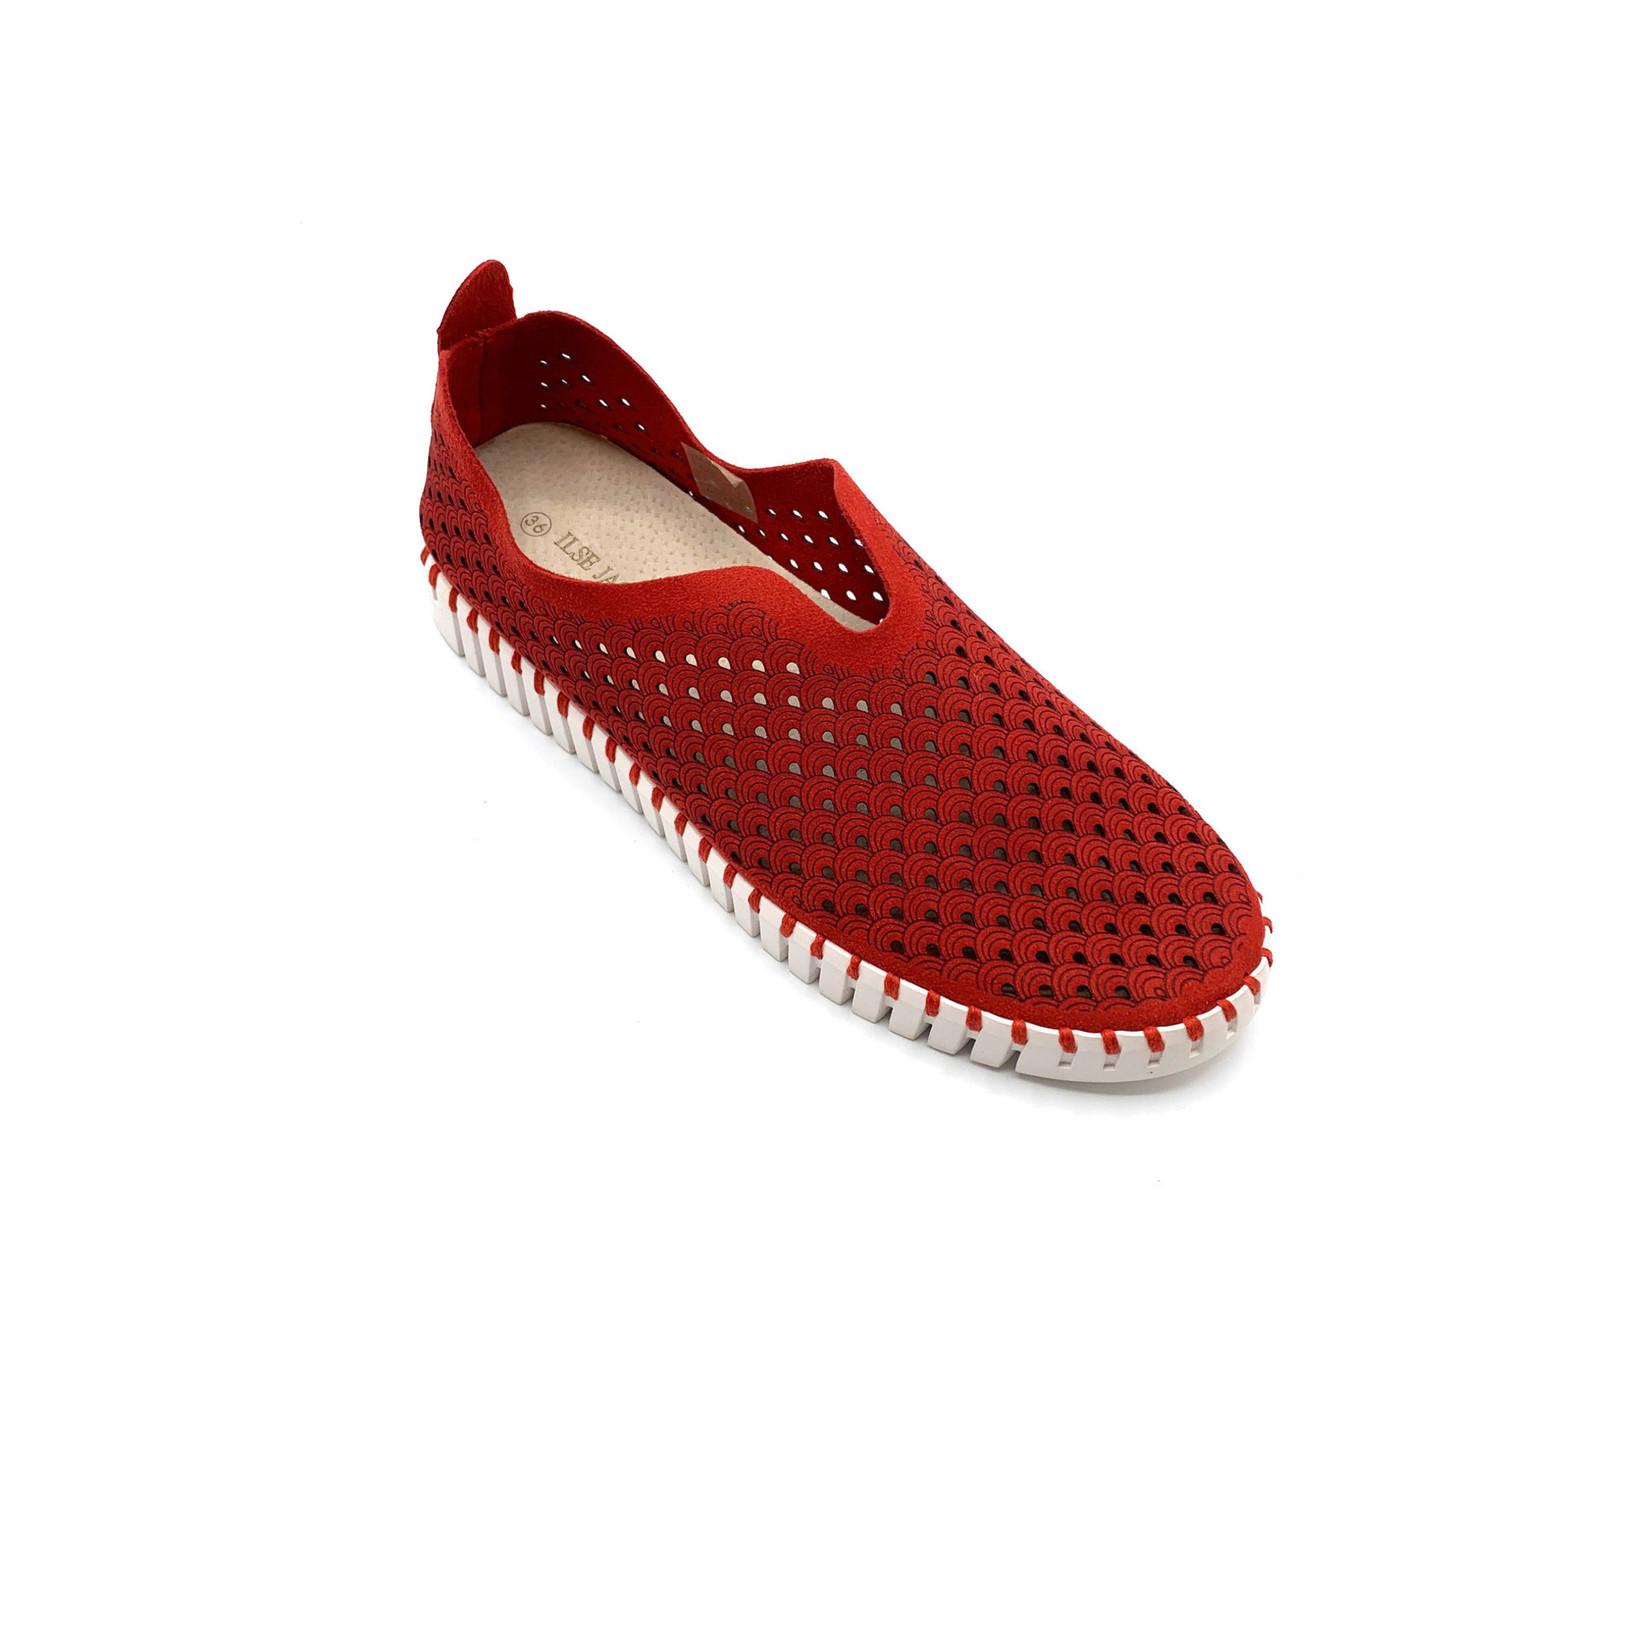 Ilse Jacobsen Tulip Red